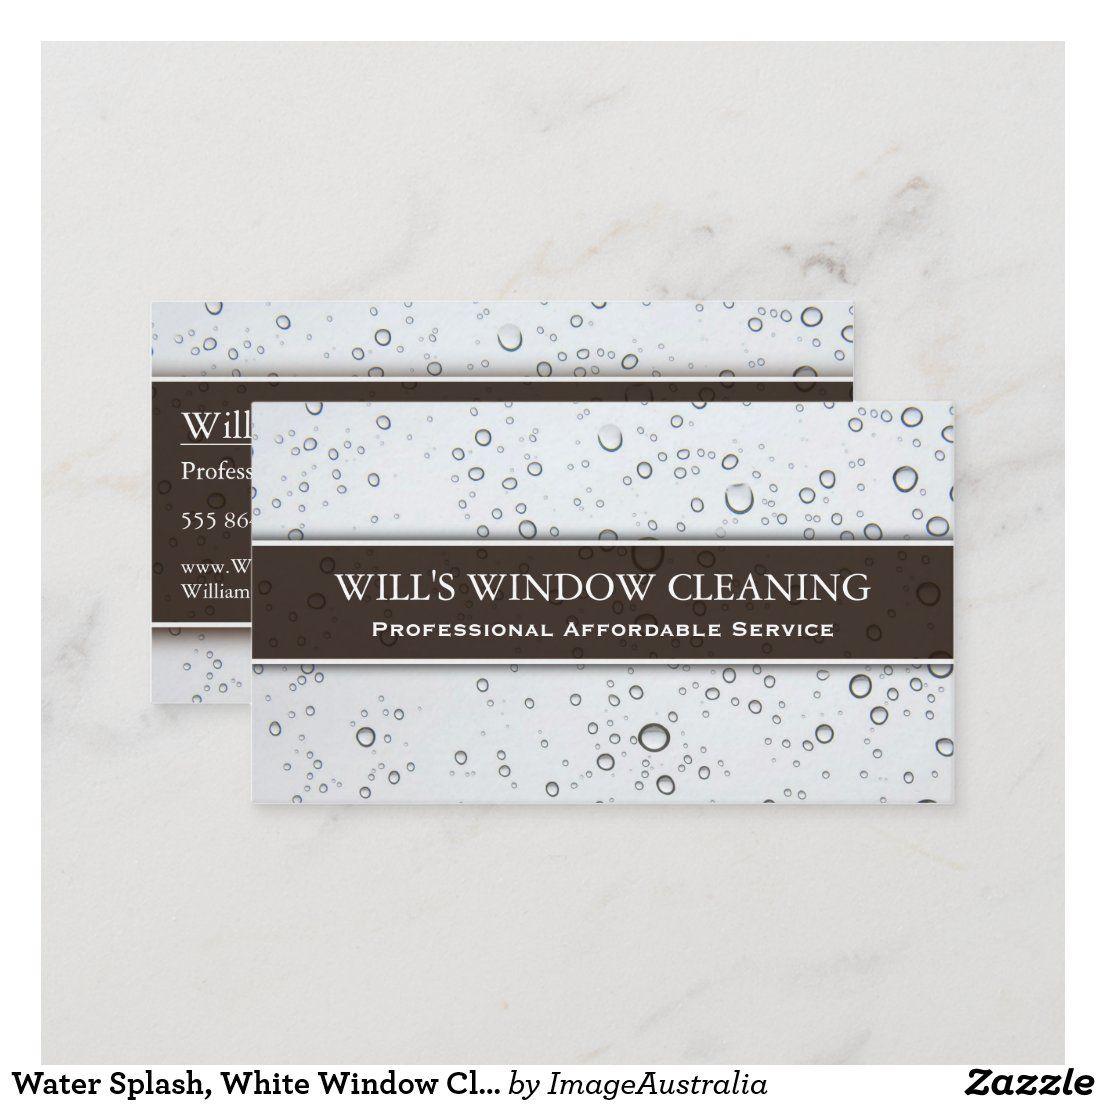 Water Splash White Window Cleaner Business Card Zazzle Com Cleaning Business Cards Window Cleaner White Windows